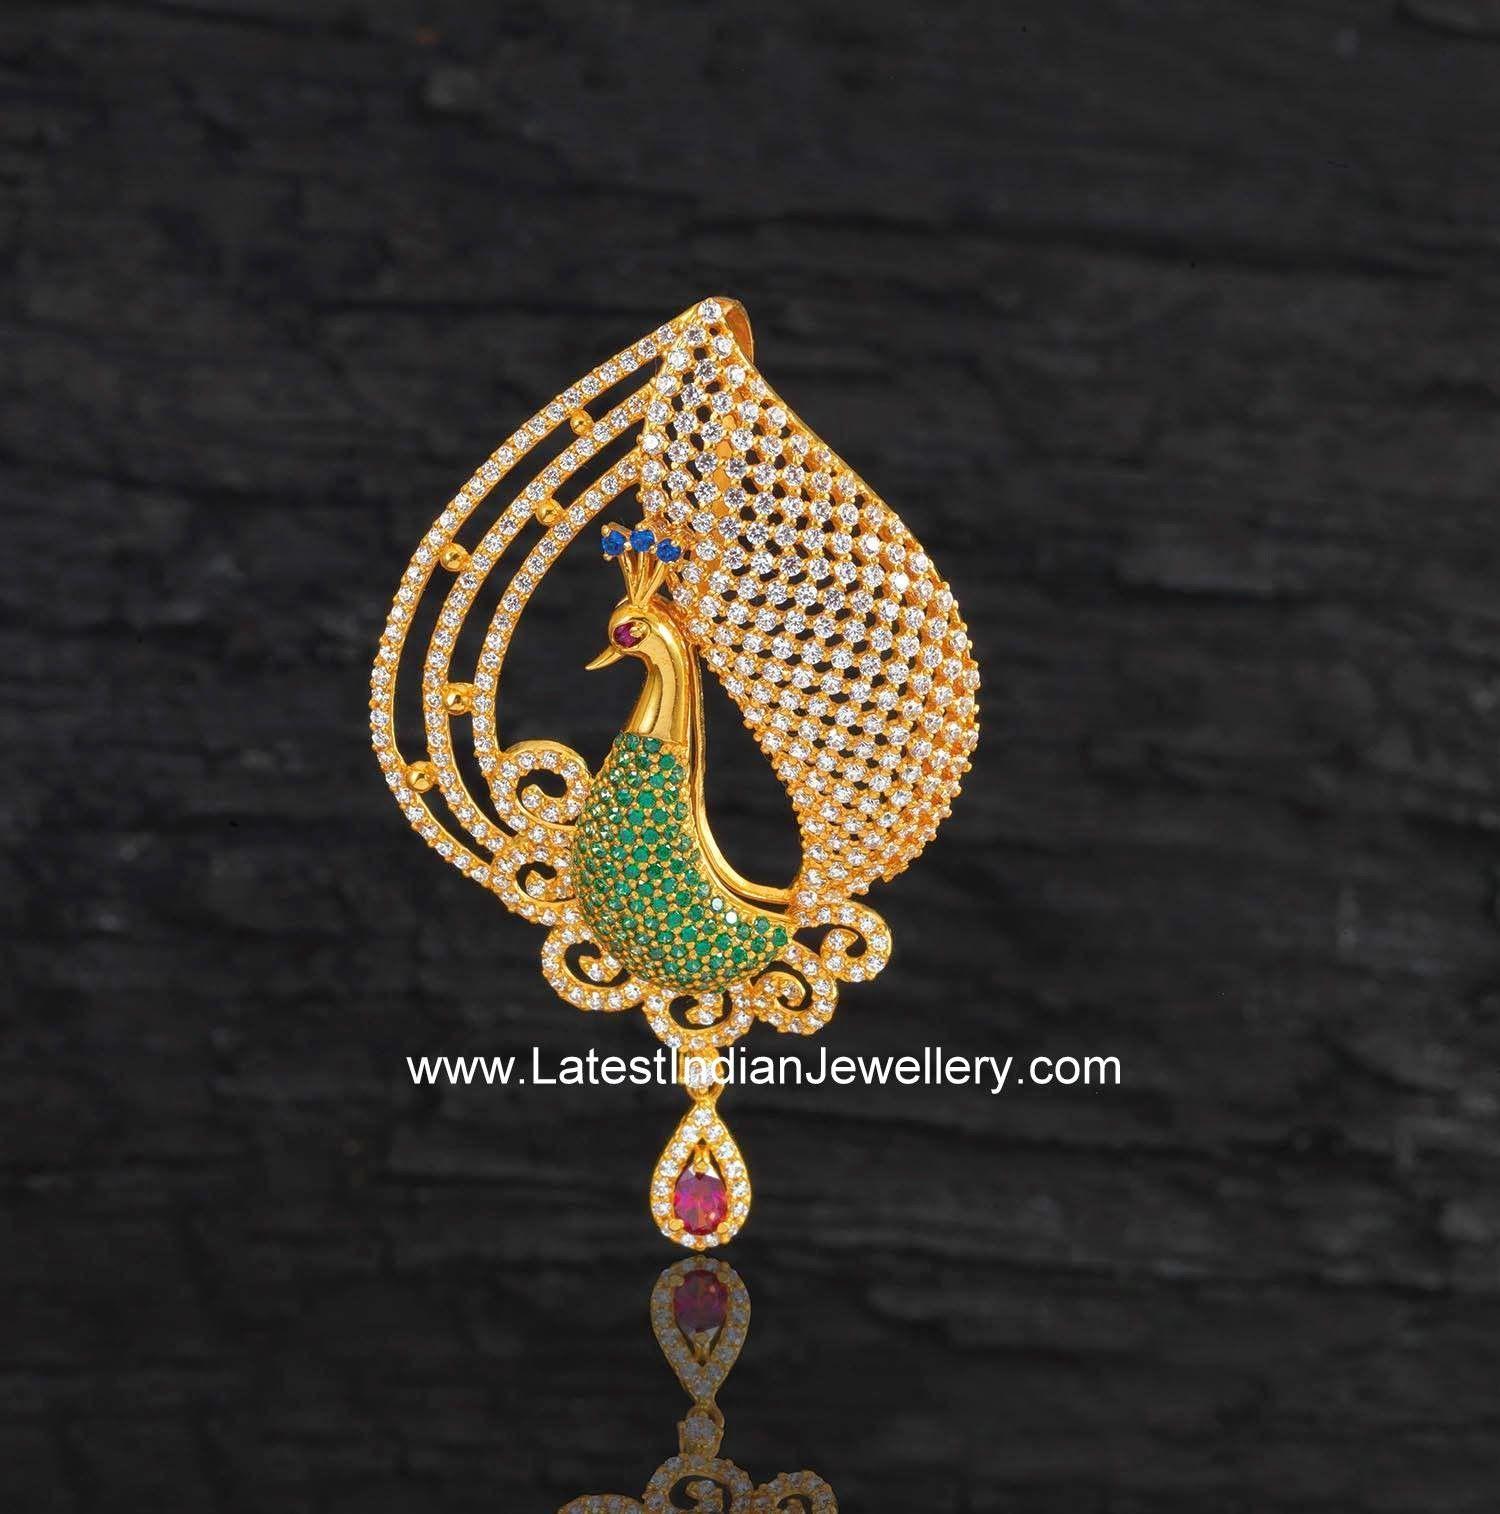 Buy Kundan Choker Necklace Priya Nacc10438c: Gemstone Colorful Peacock Pendant